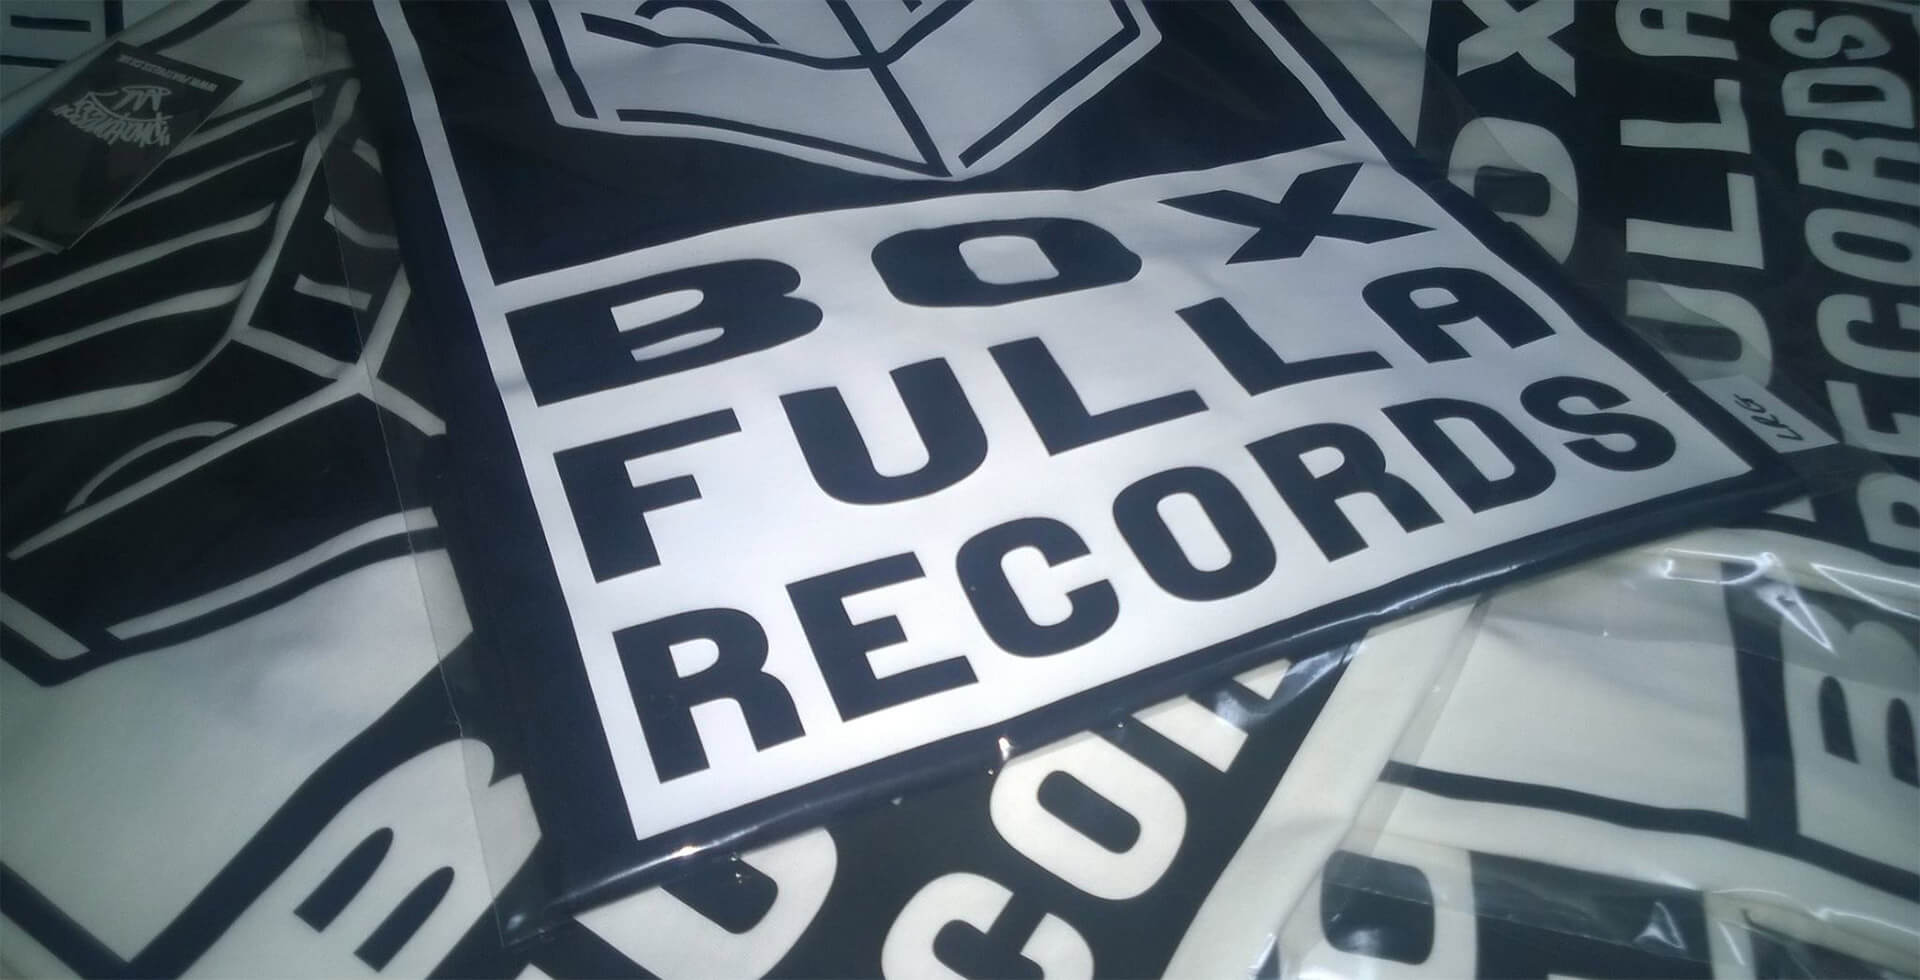 Box Fulla Records at Wilkswood Reggae 2018